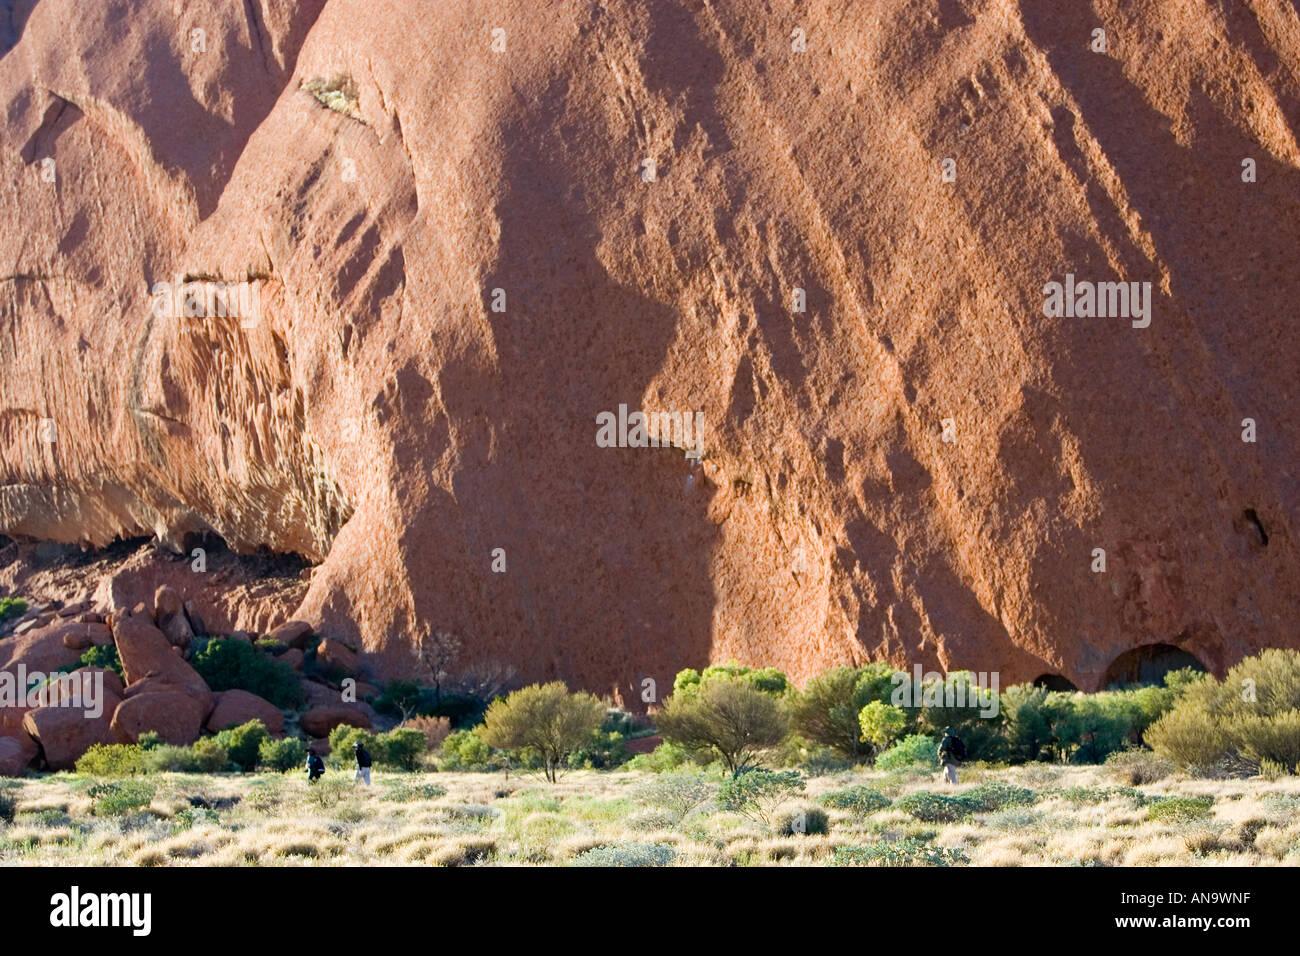 Los turistas en la base del Uluru Ayers Rock Australia Foto de stock